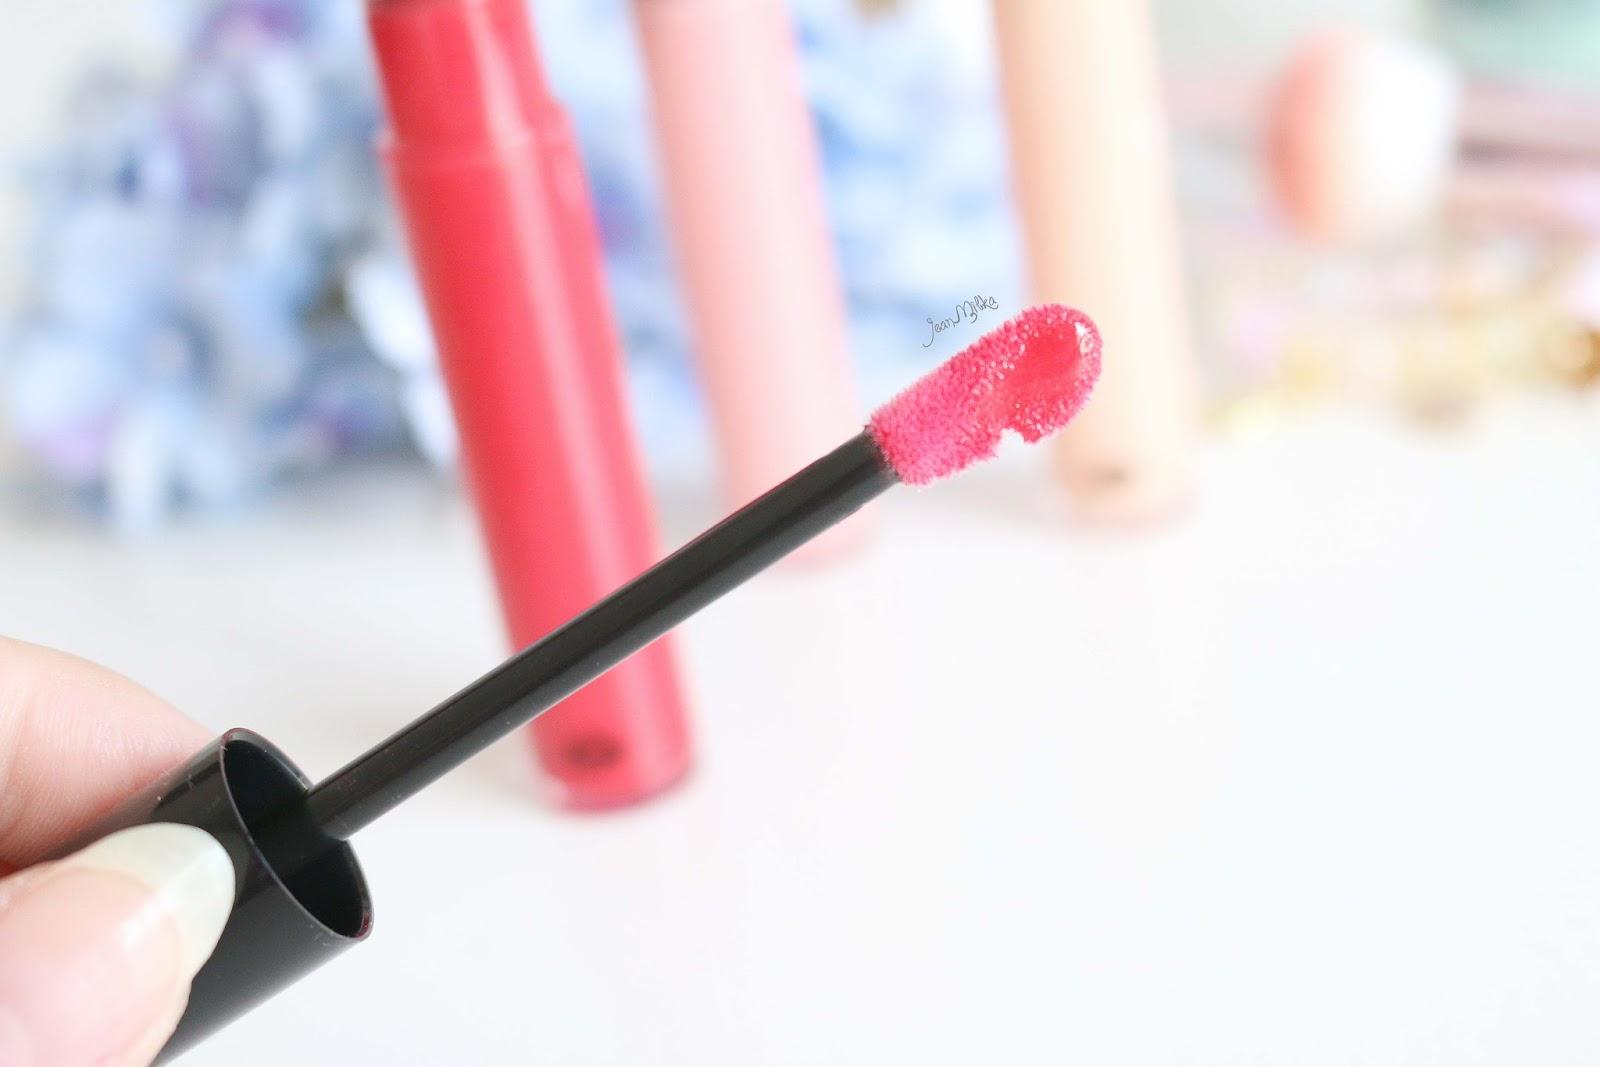 make up for ever, makeup forever, artist plexi gloss, plexi gloss, lip gloss, makeup, review, swatch, mufe, superflex